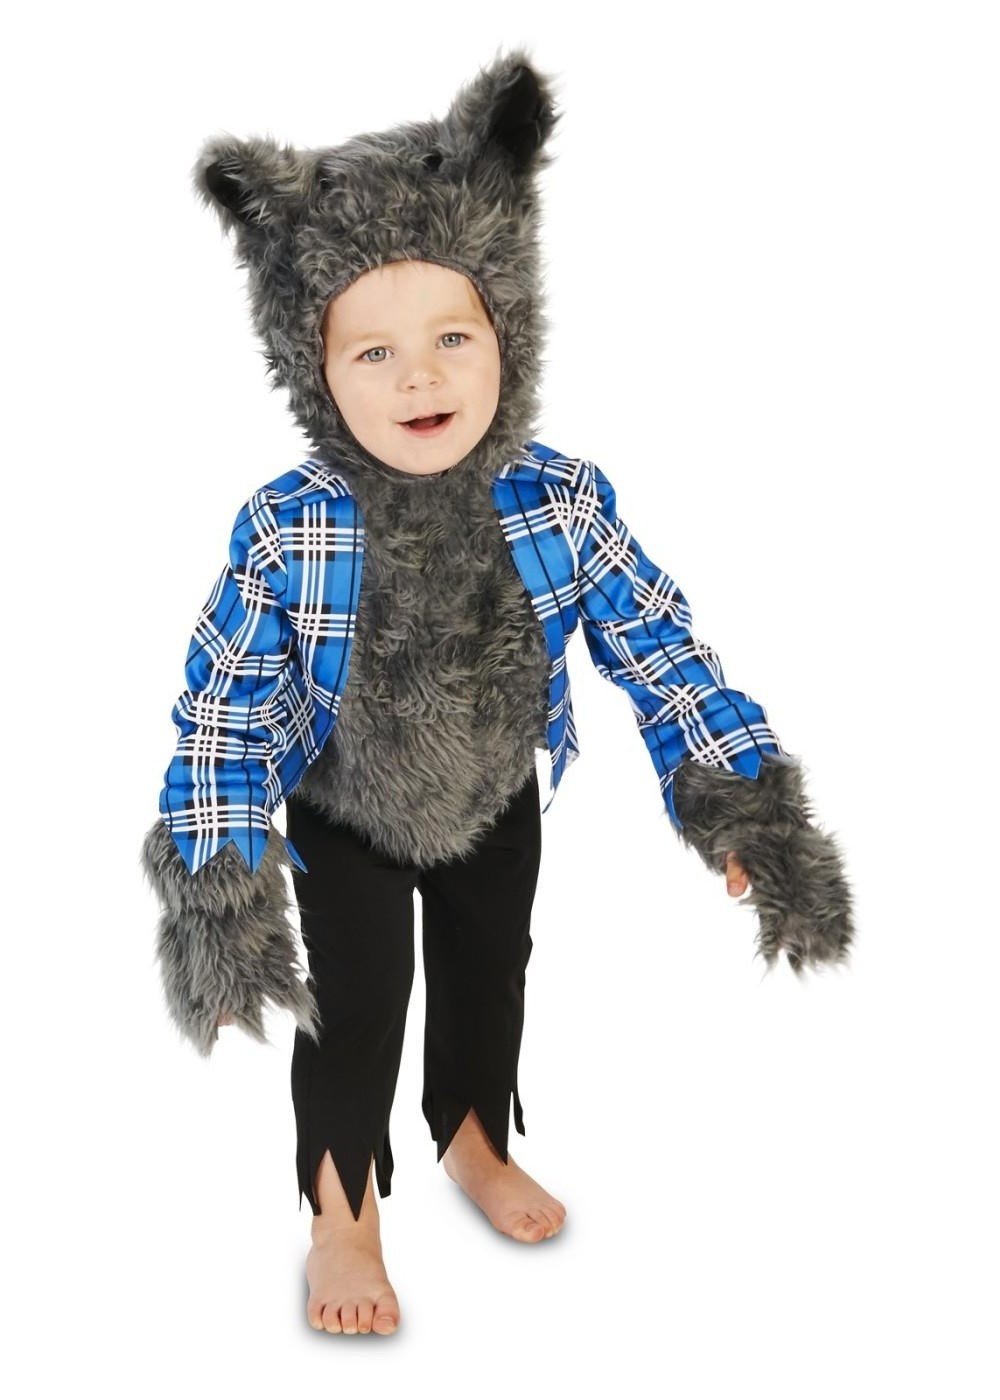 Werewolf Toys For Boys : Toddler girls little werewolf costume animal costumes